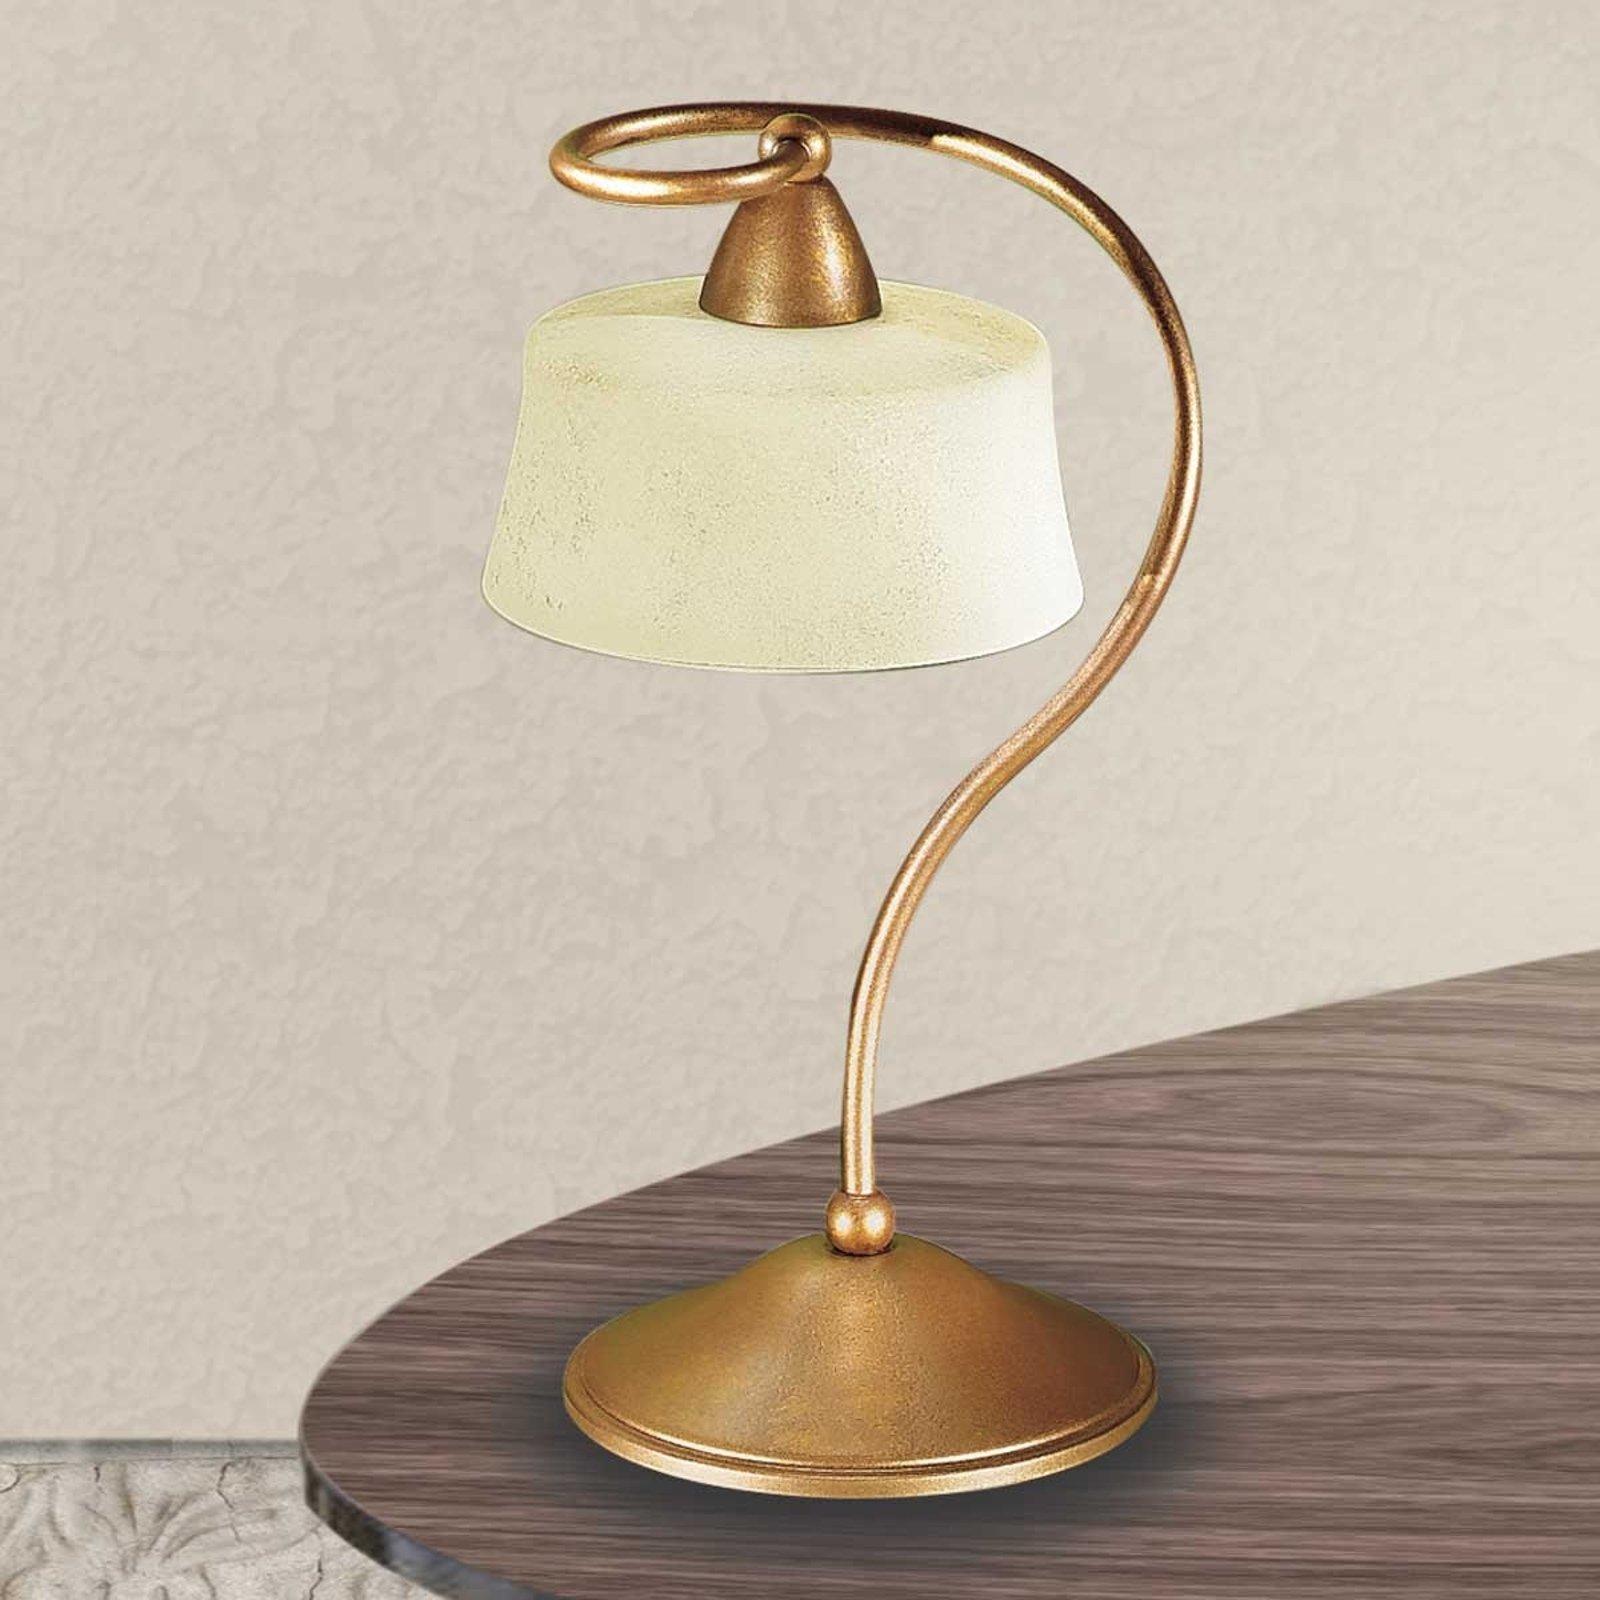 Bordlampe Alessio 1 lyskilde hengende